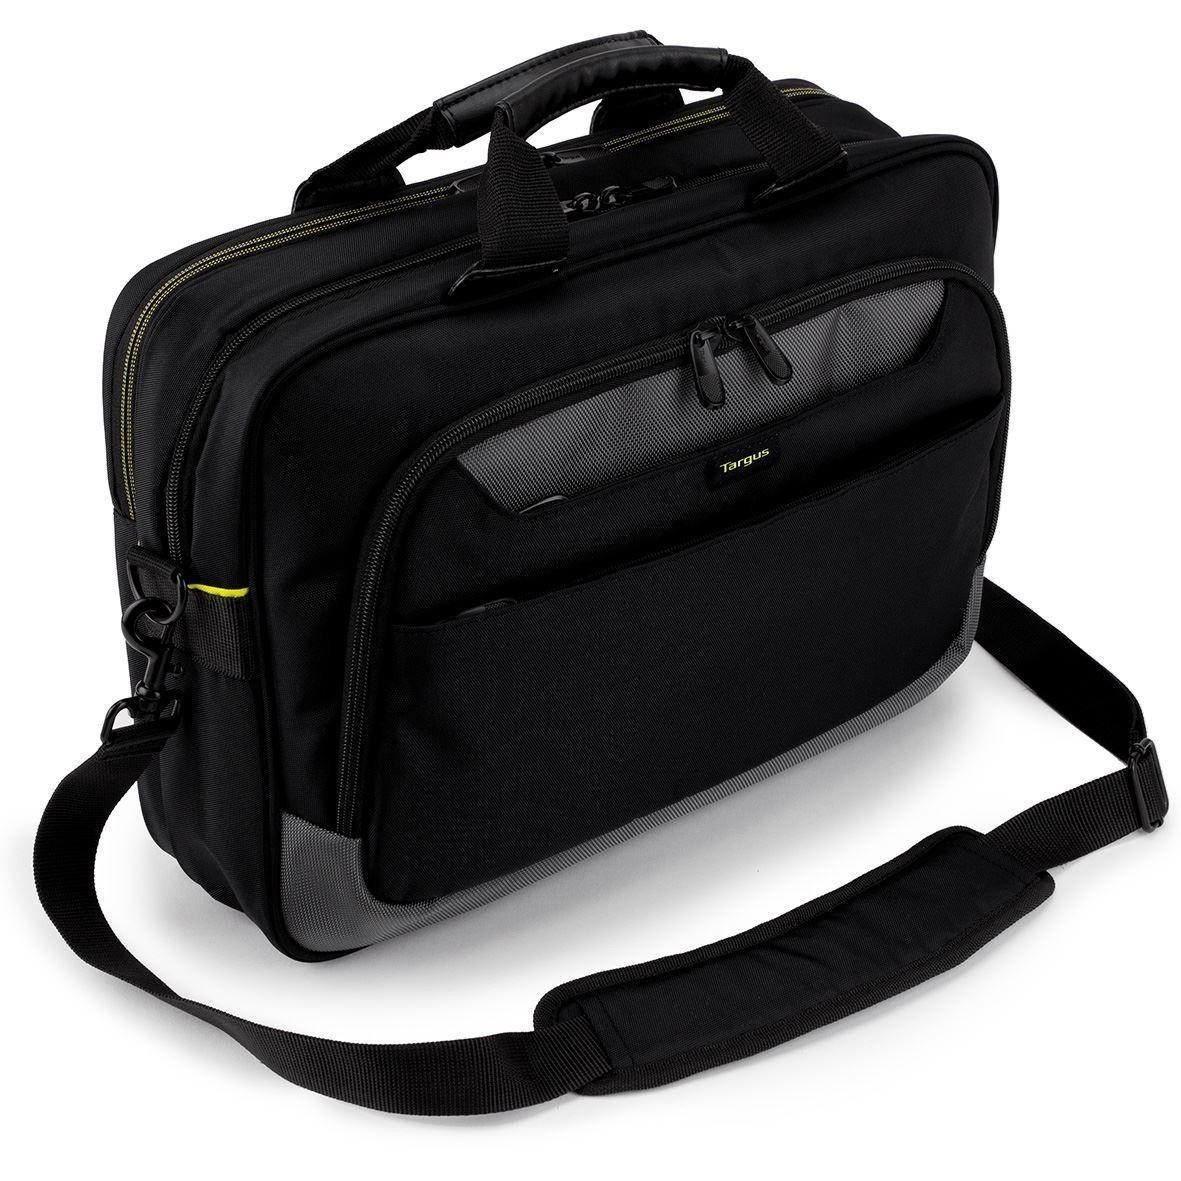 Targus torba do laptopa CityGear 14'' Topload, czarna